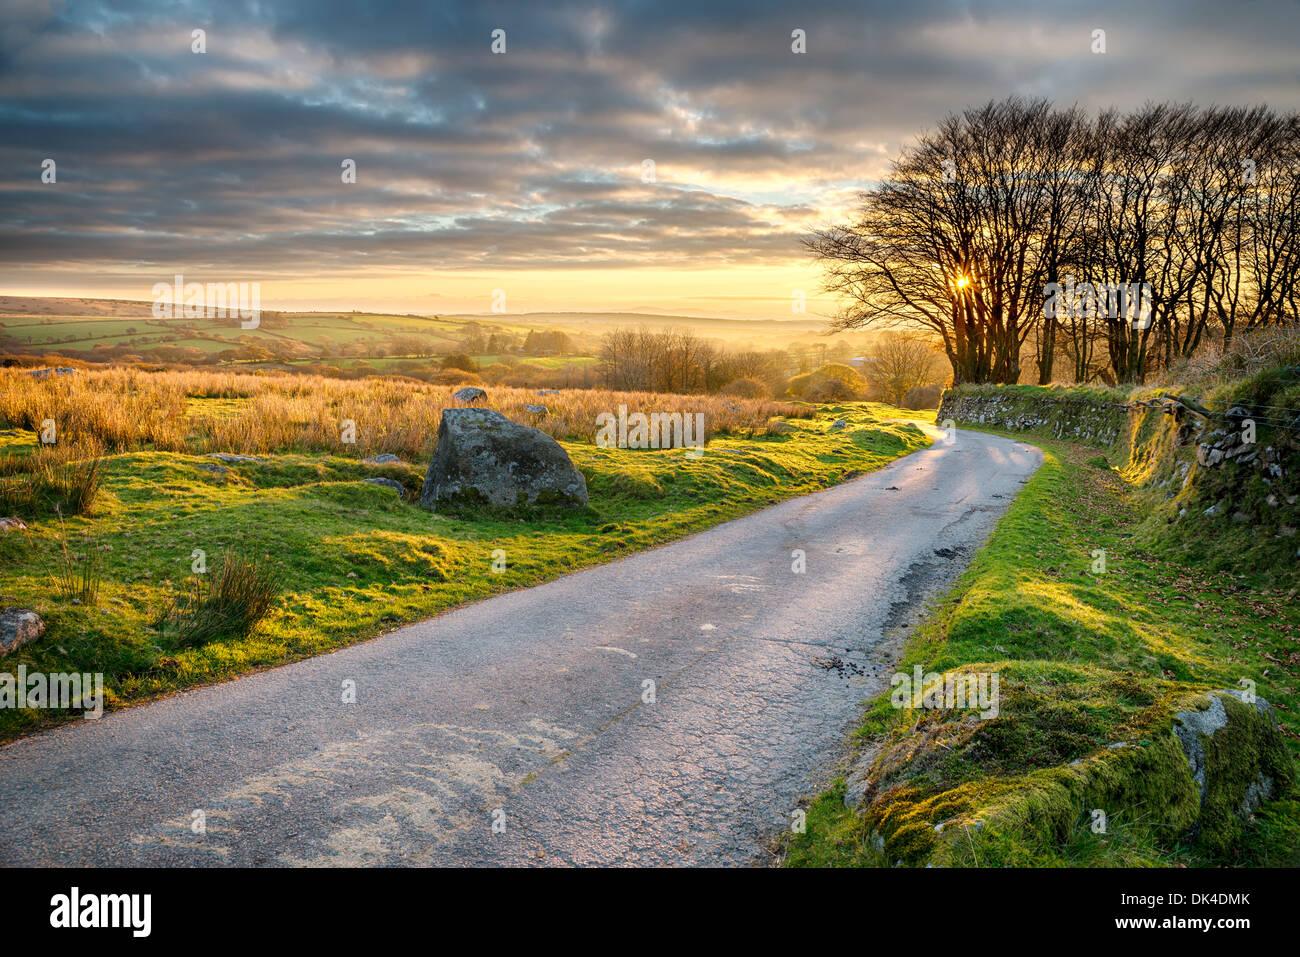 Un Carril del país conduce a través de Bodmin Moor en Cornwall. Imagen De Stock